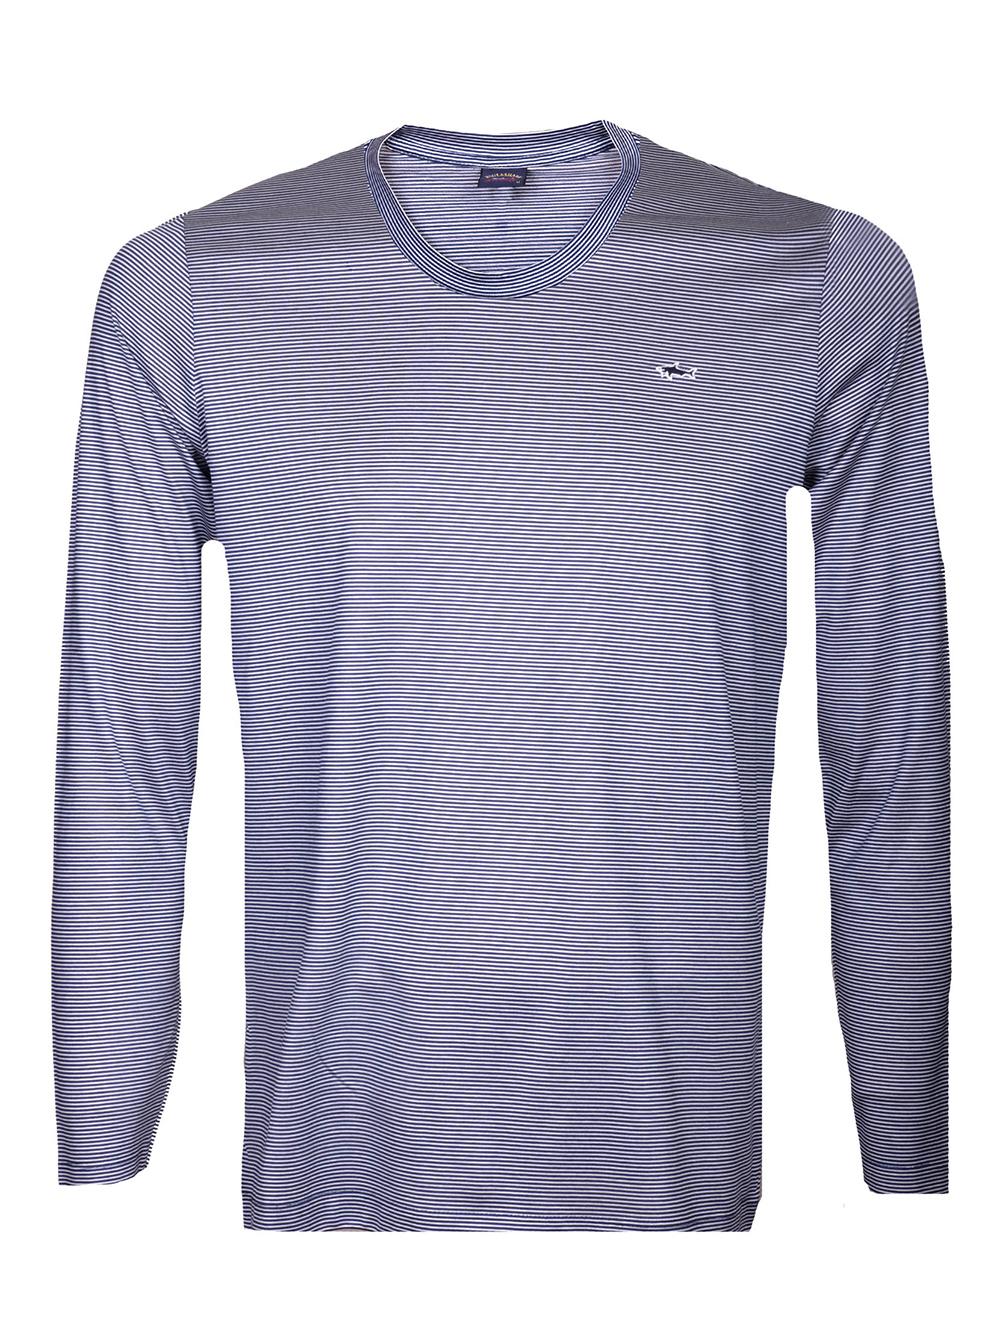 PAUL & SHARK Μπλούζα T-Shirt P19P1508 ΡΙΓΕ ΜΠΛΕ